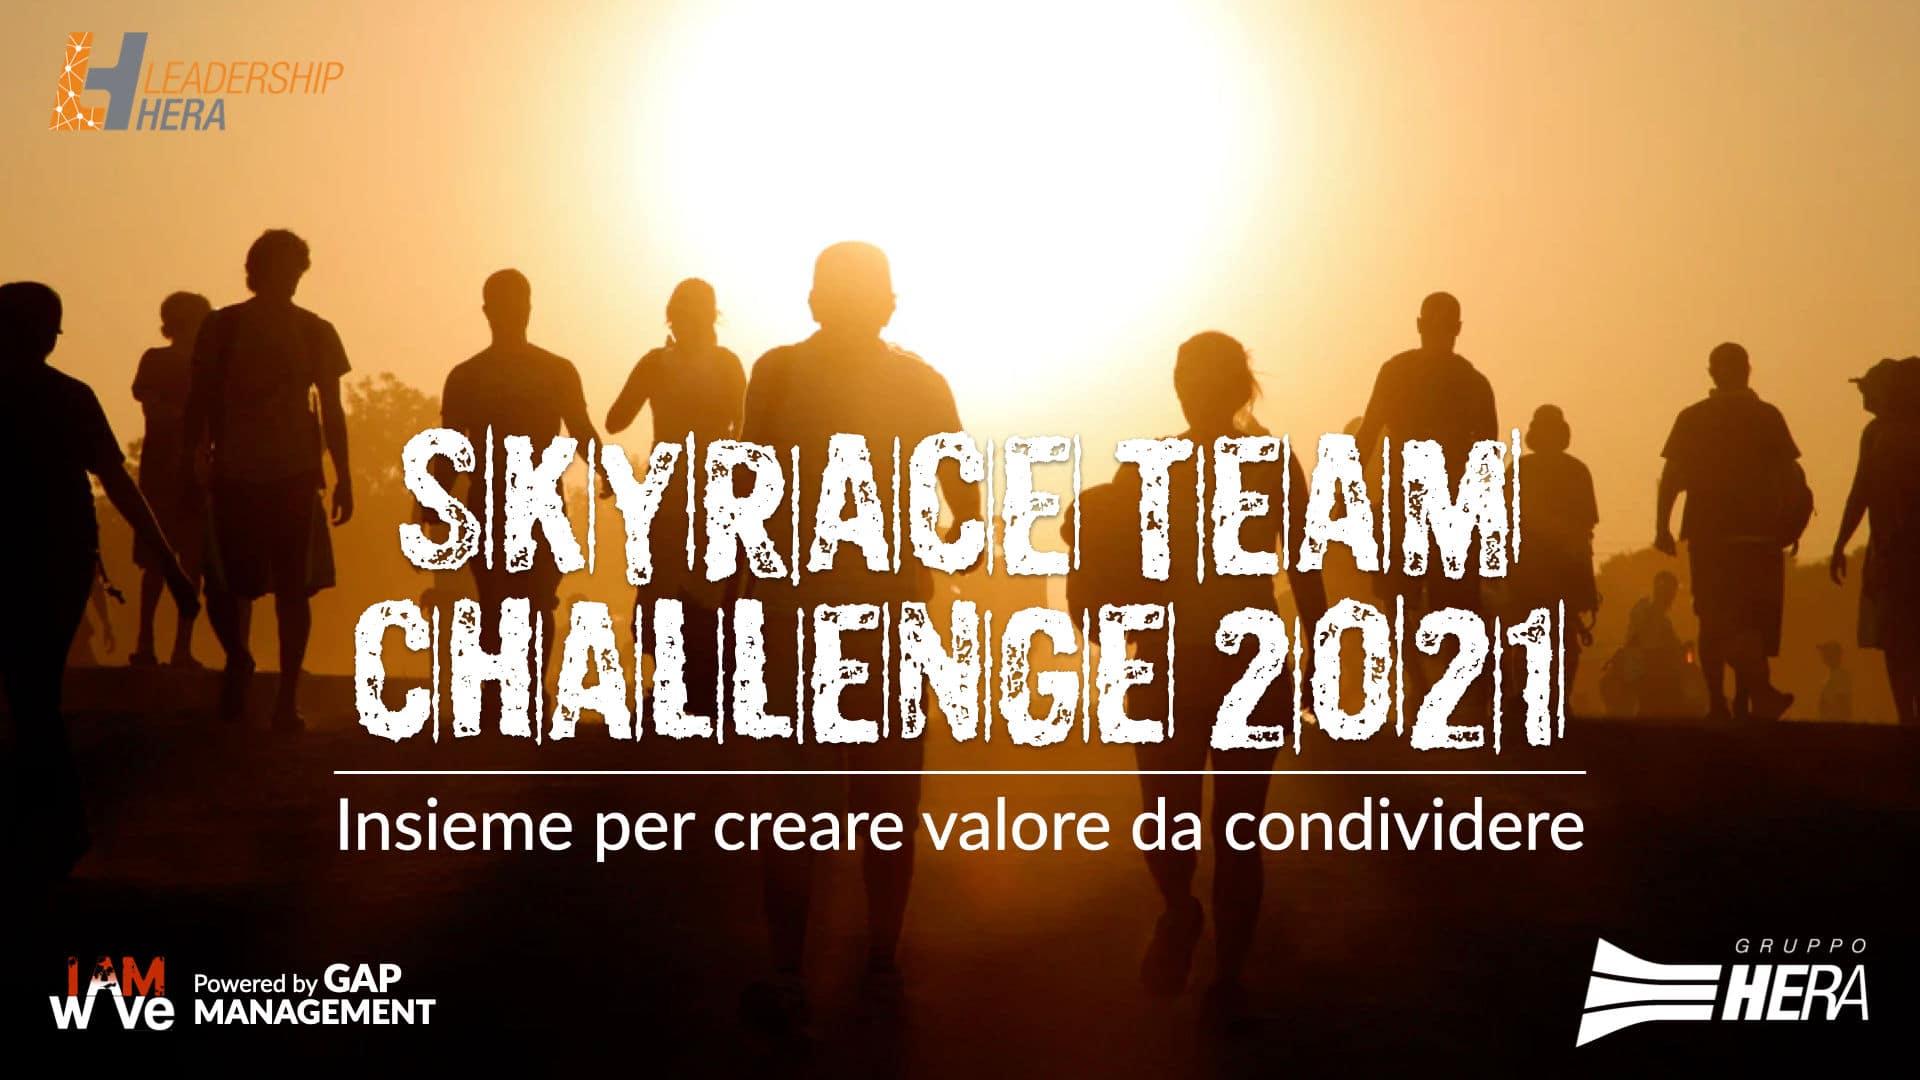 SkyRace Team Challenge 2021